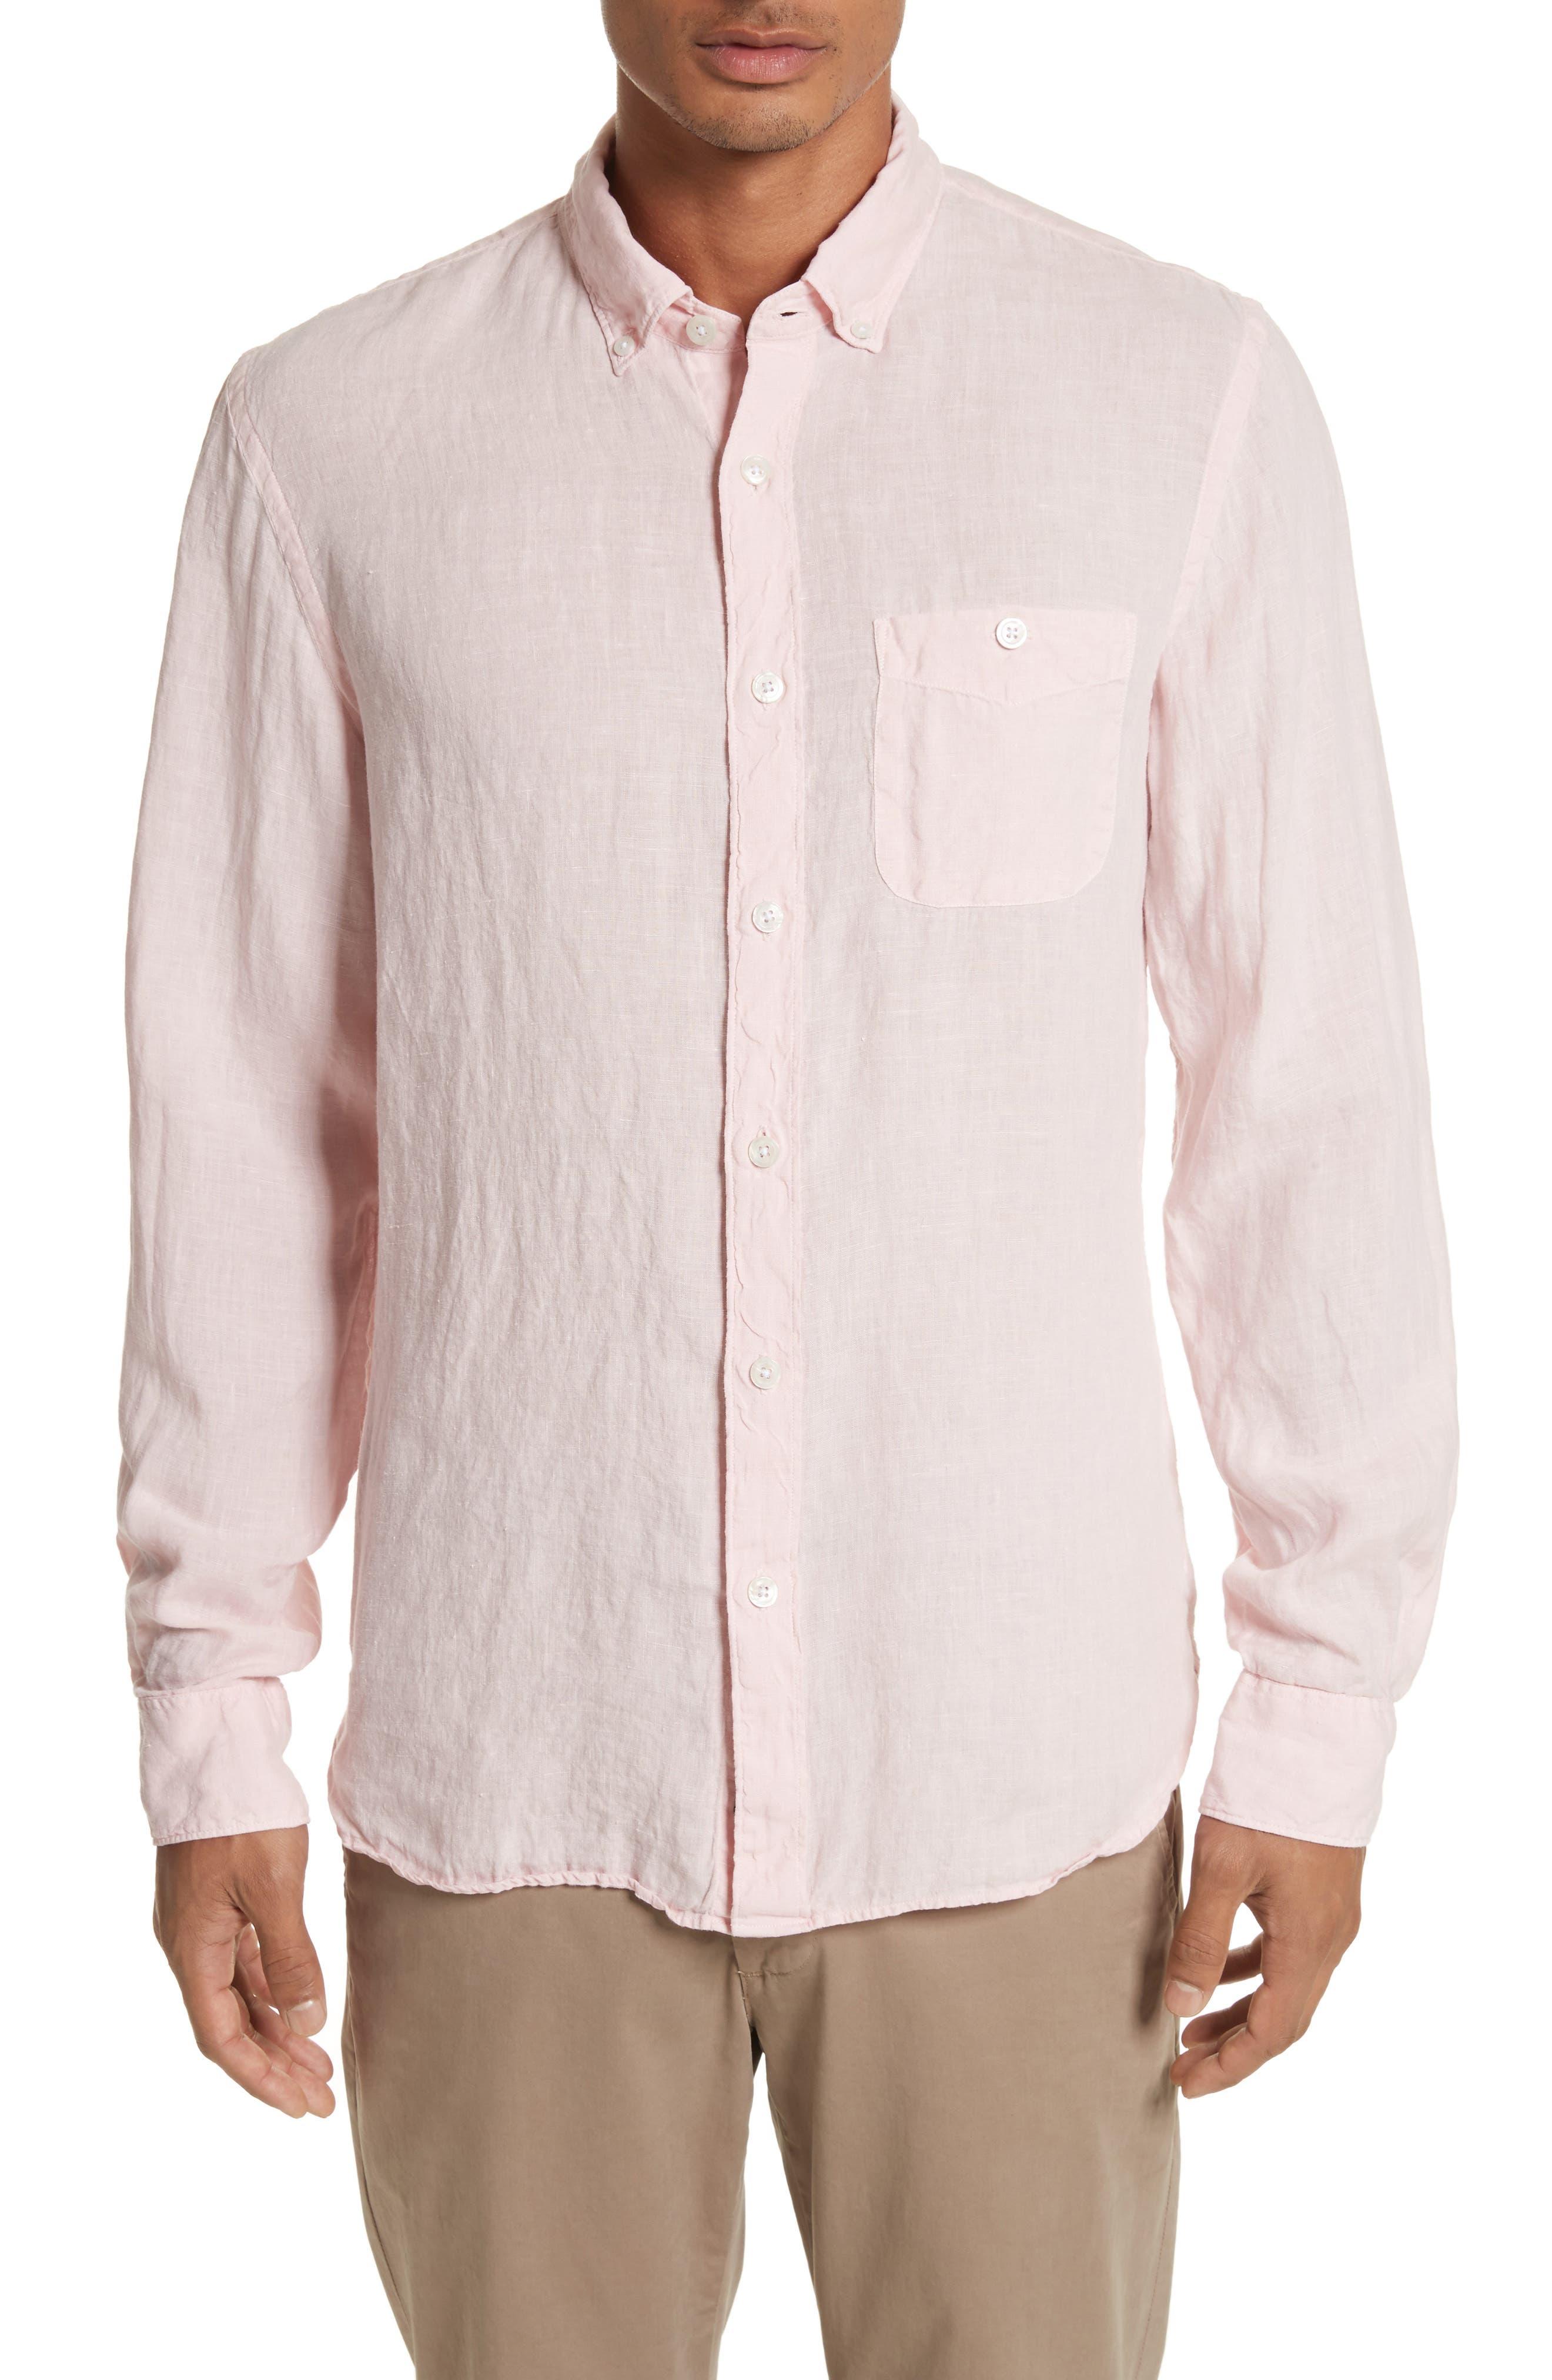 Main Image - Todd Snyder Linen Woven Shirt